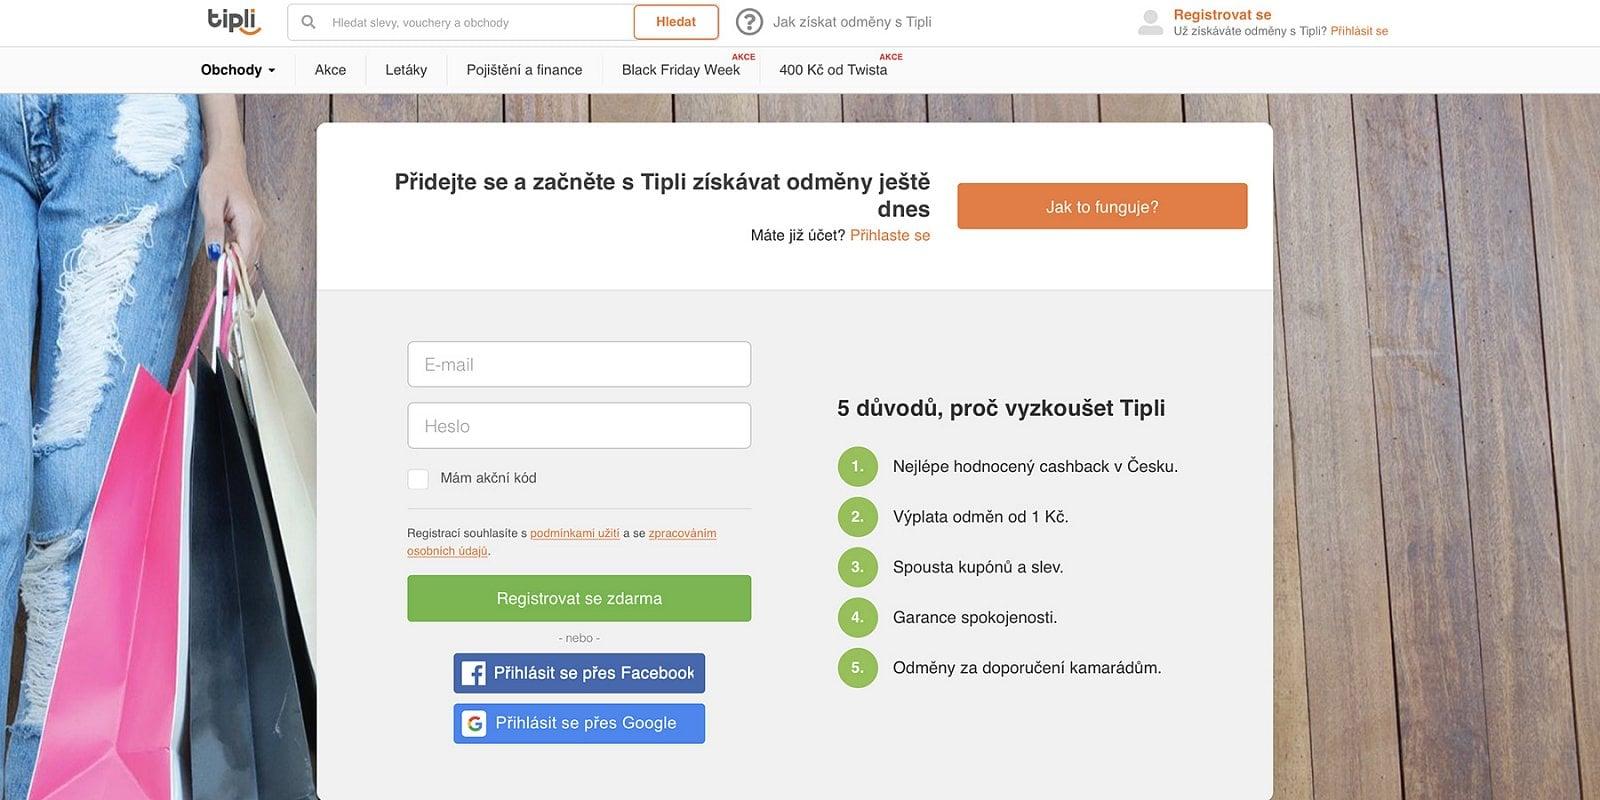 Jak funguje Tipli.cz